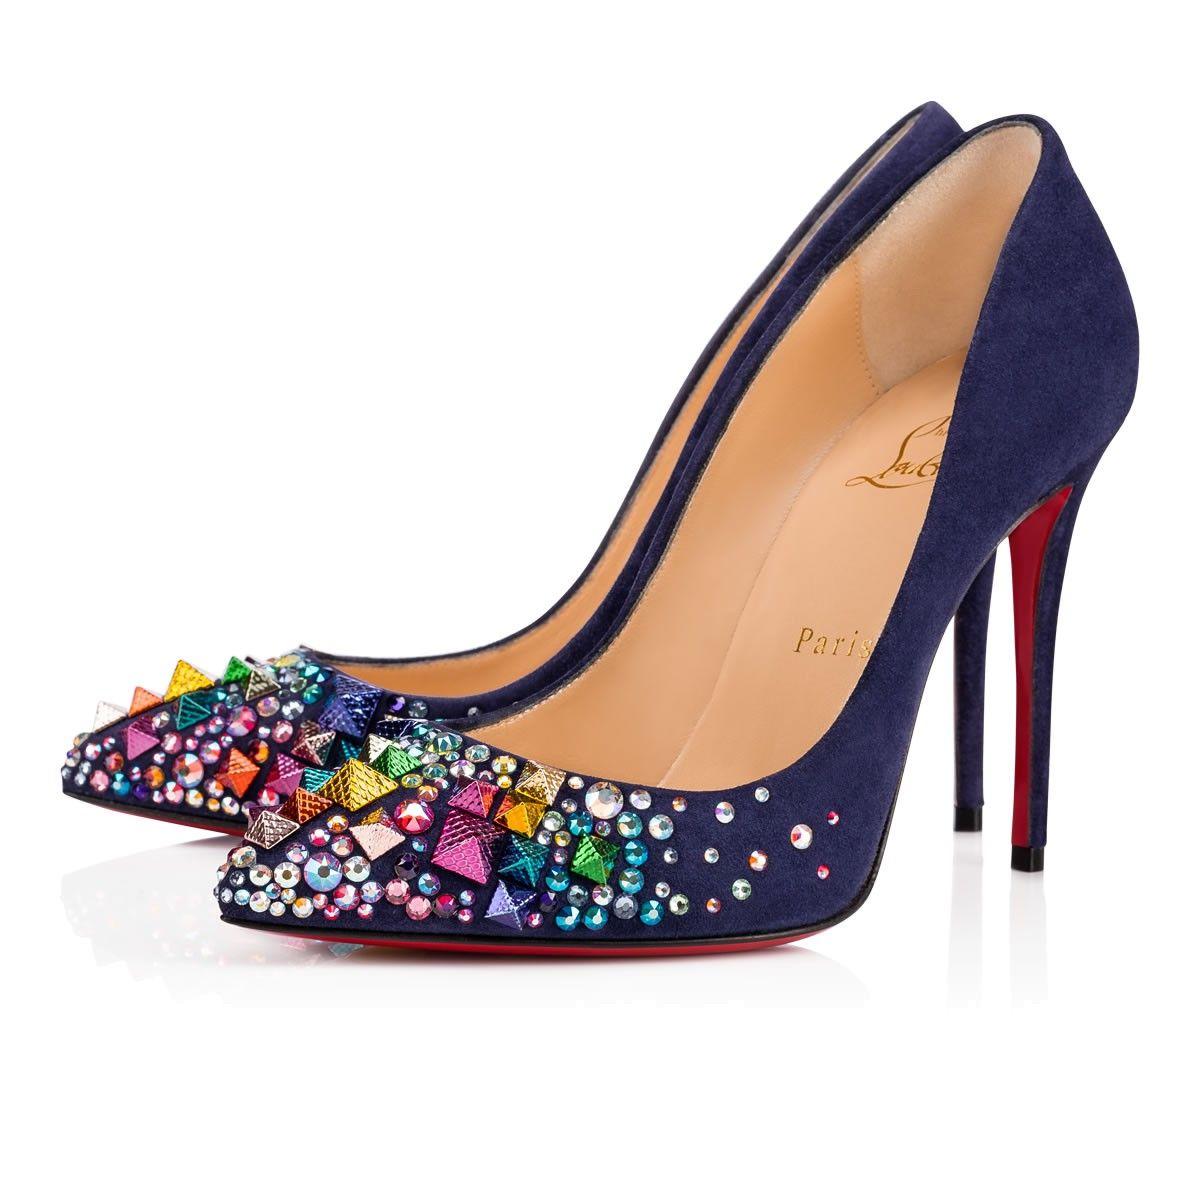 39312220d0a ... netherlands keopump 100 china blue mix multicolor strass women shoes  christian louboutin 56ead 0ce8c ...